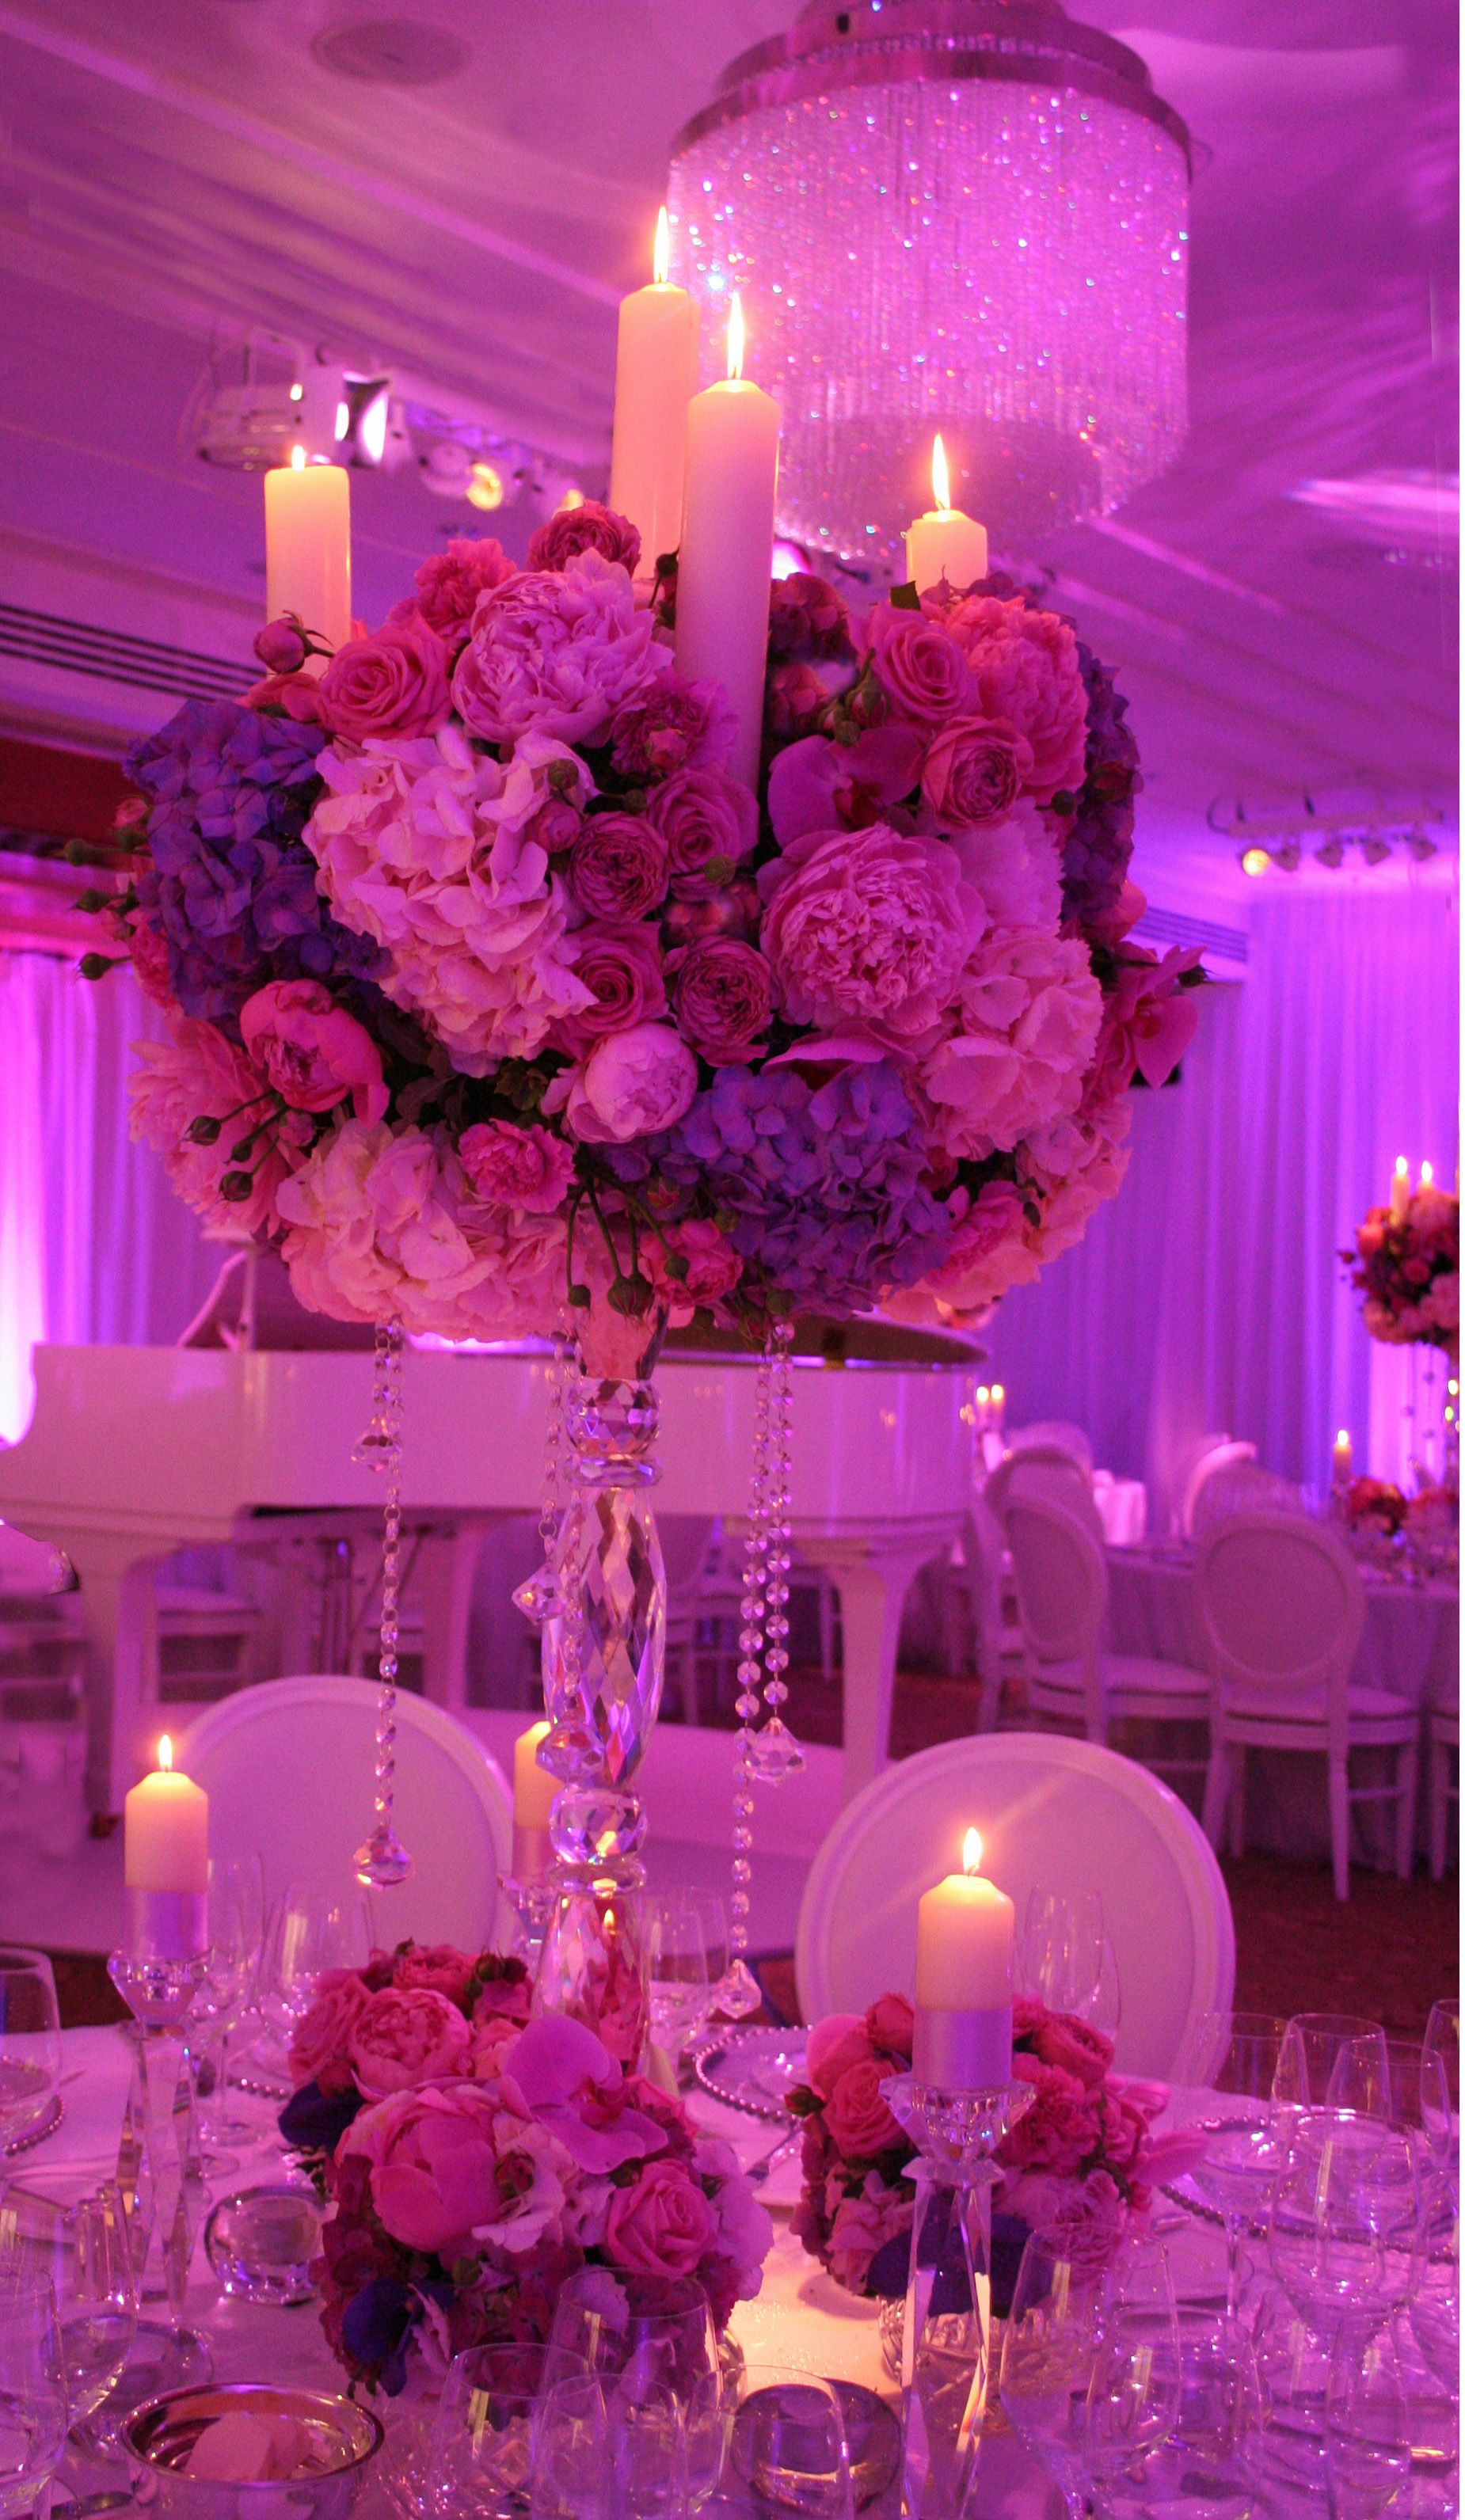 Luxury wedding decoration ideas  Wedding at the Four Seasons Park Lane London  Décoration